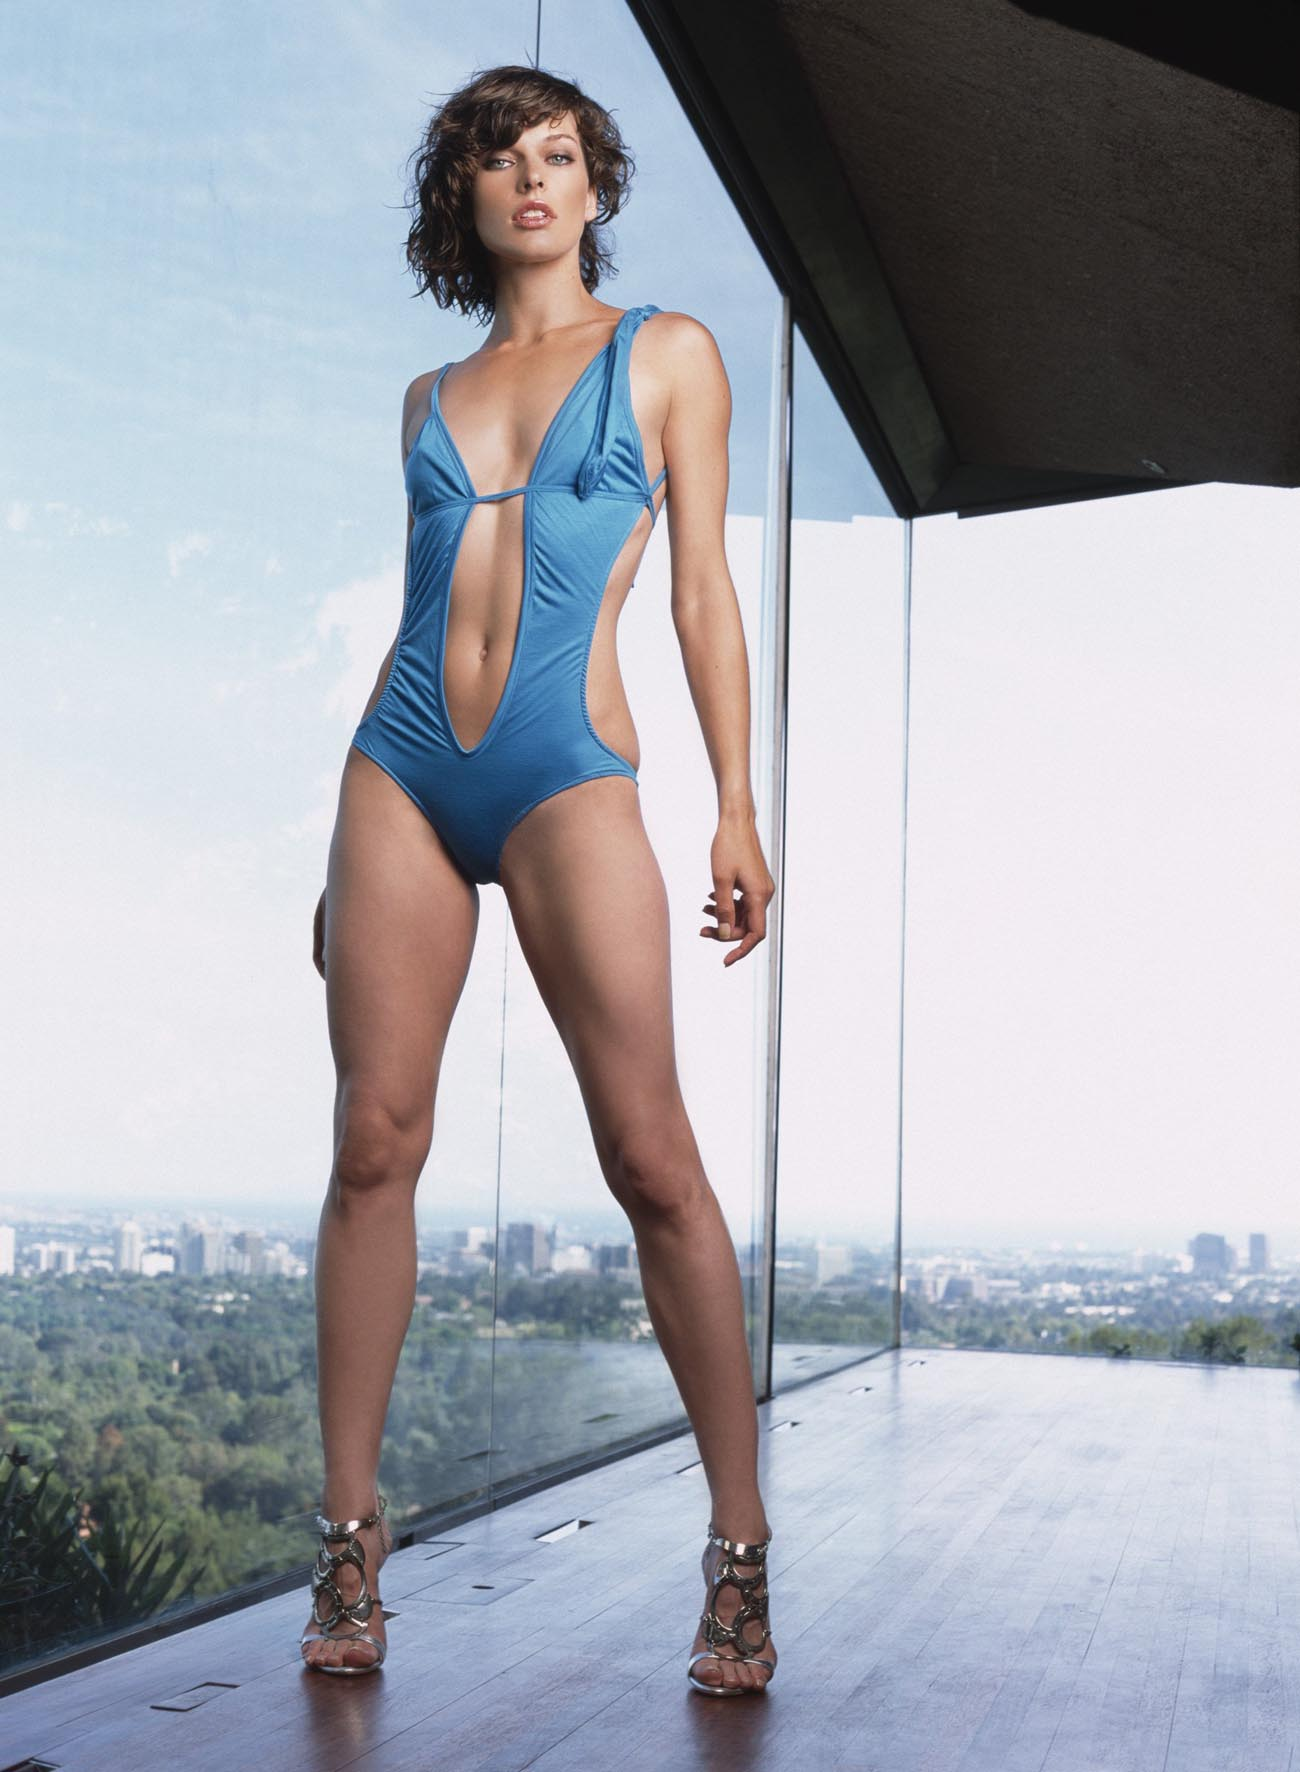 Imagefap nude pic xxx film